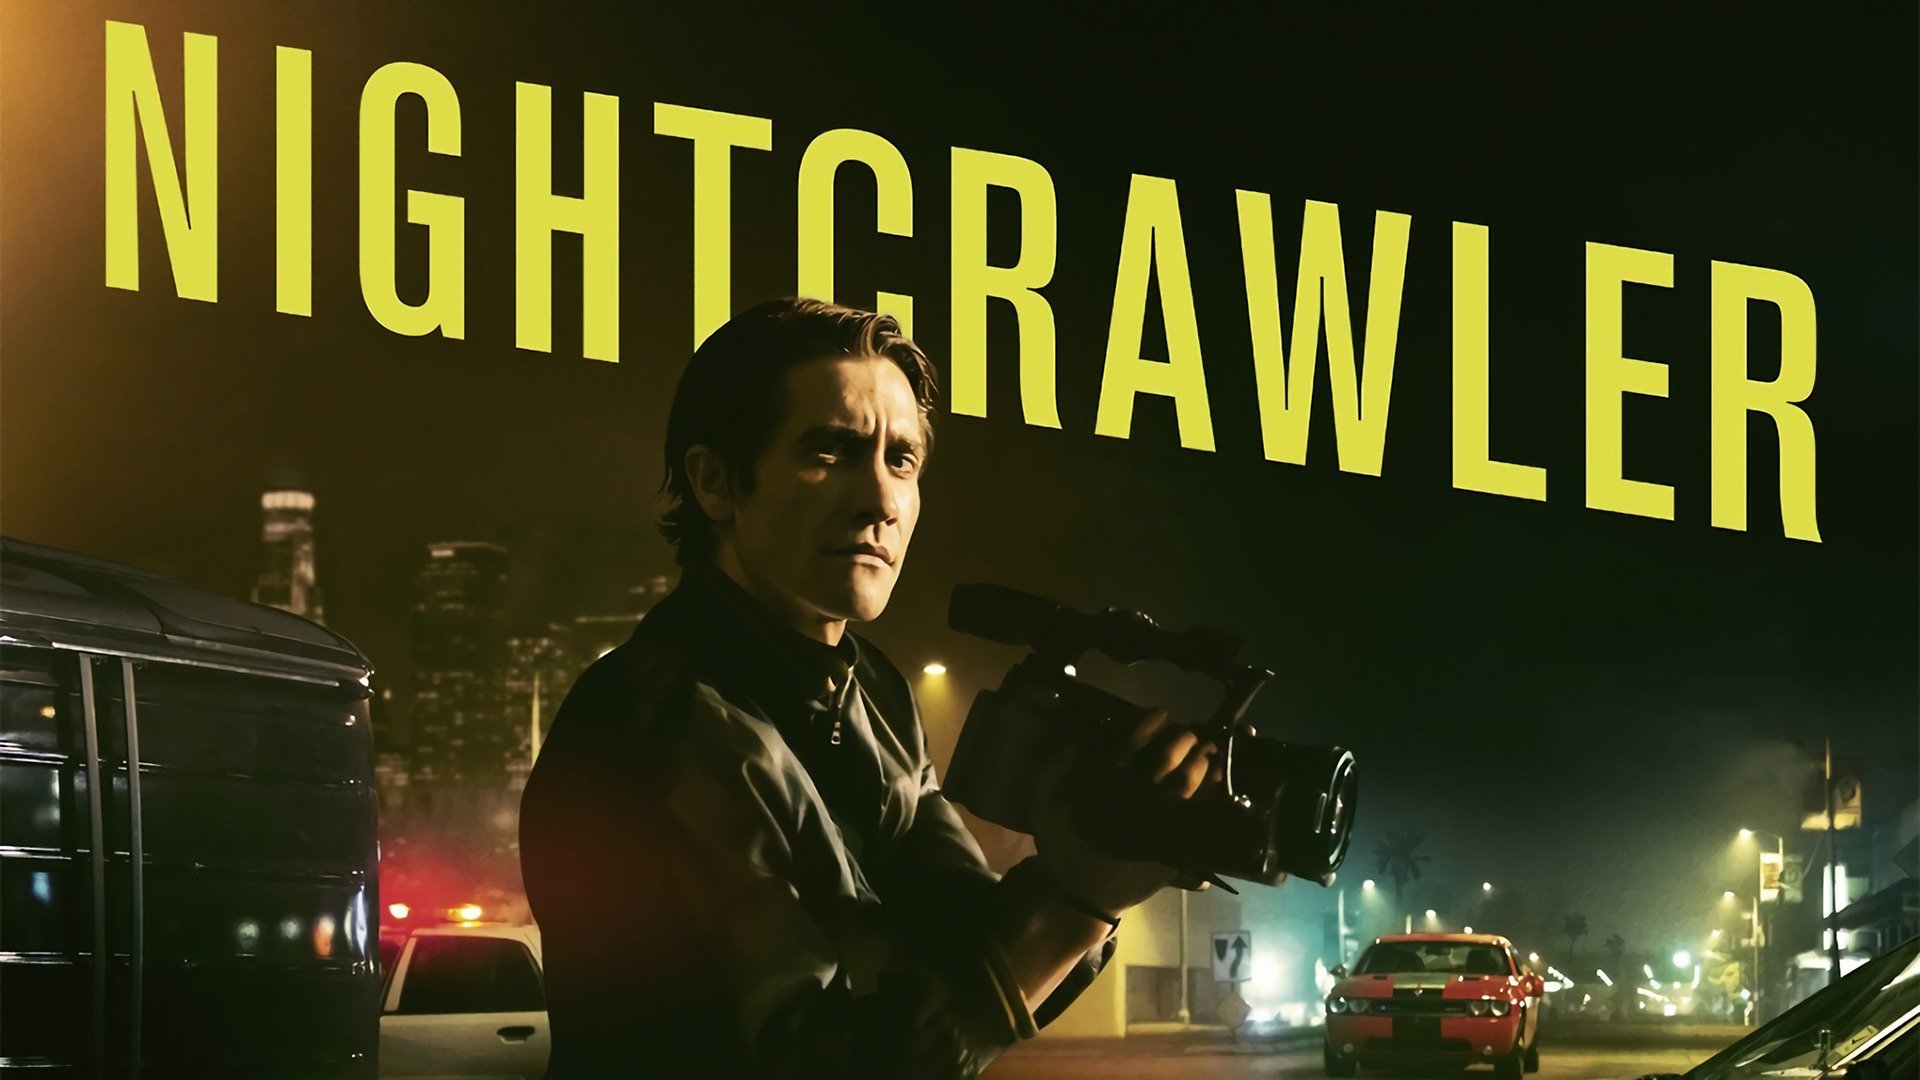 Nightcrawler 2014 Review